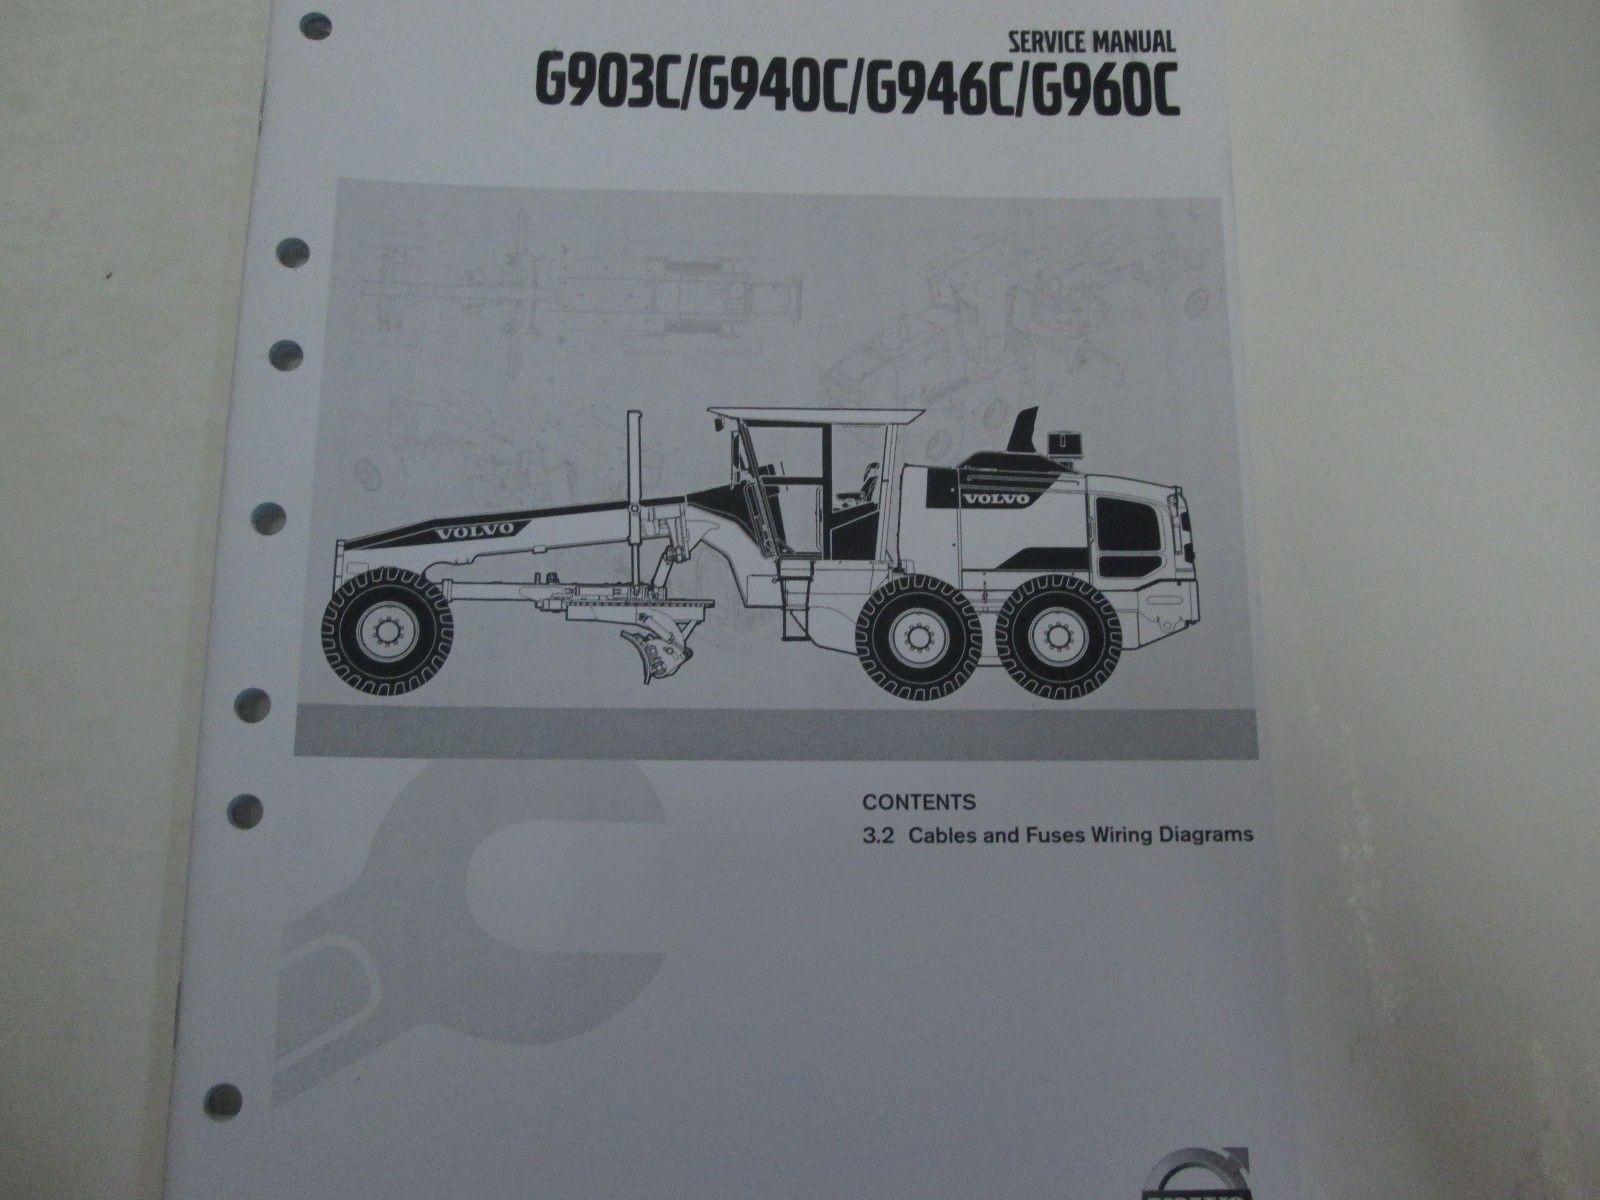 hight resolution of 2015 volvo g903c g940c g946c g960c service repair manual 3 volume set factory 15